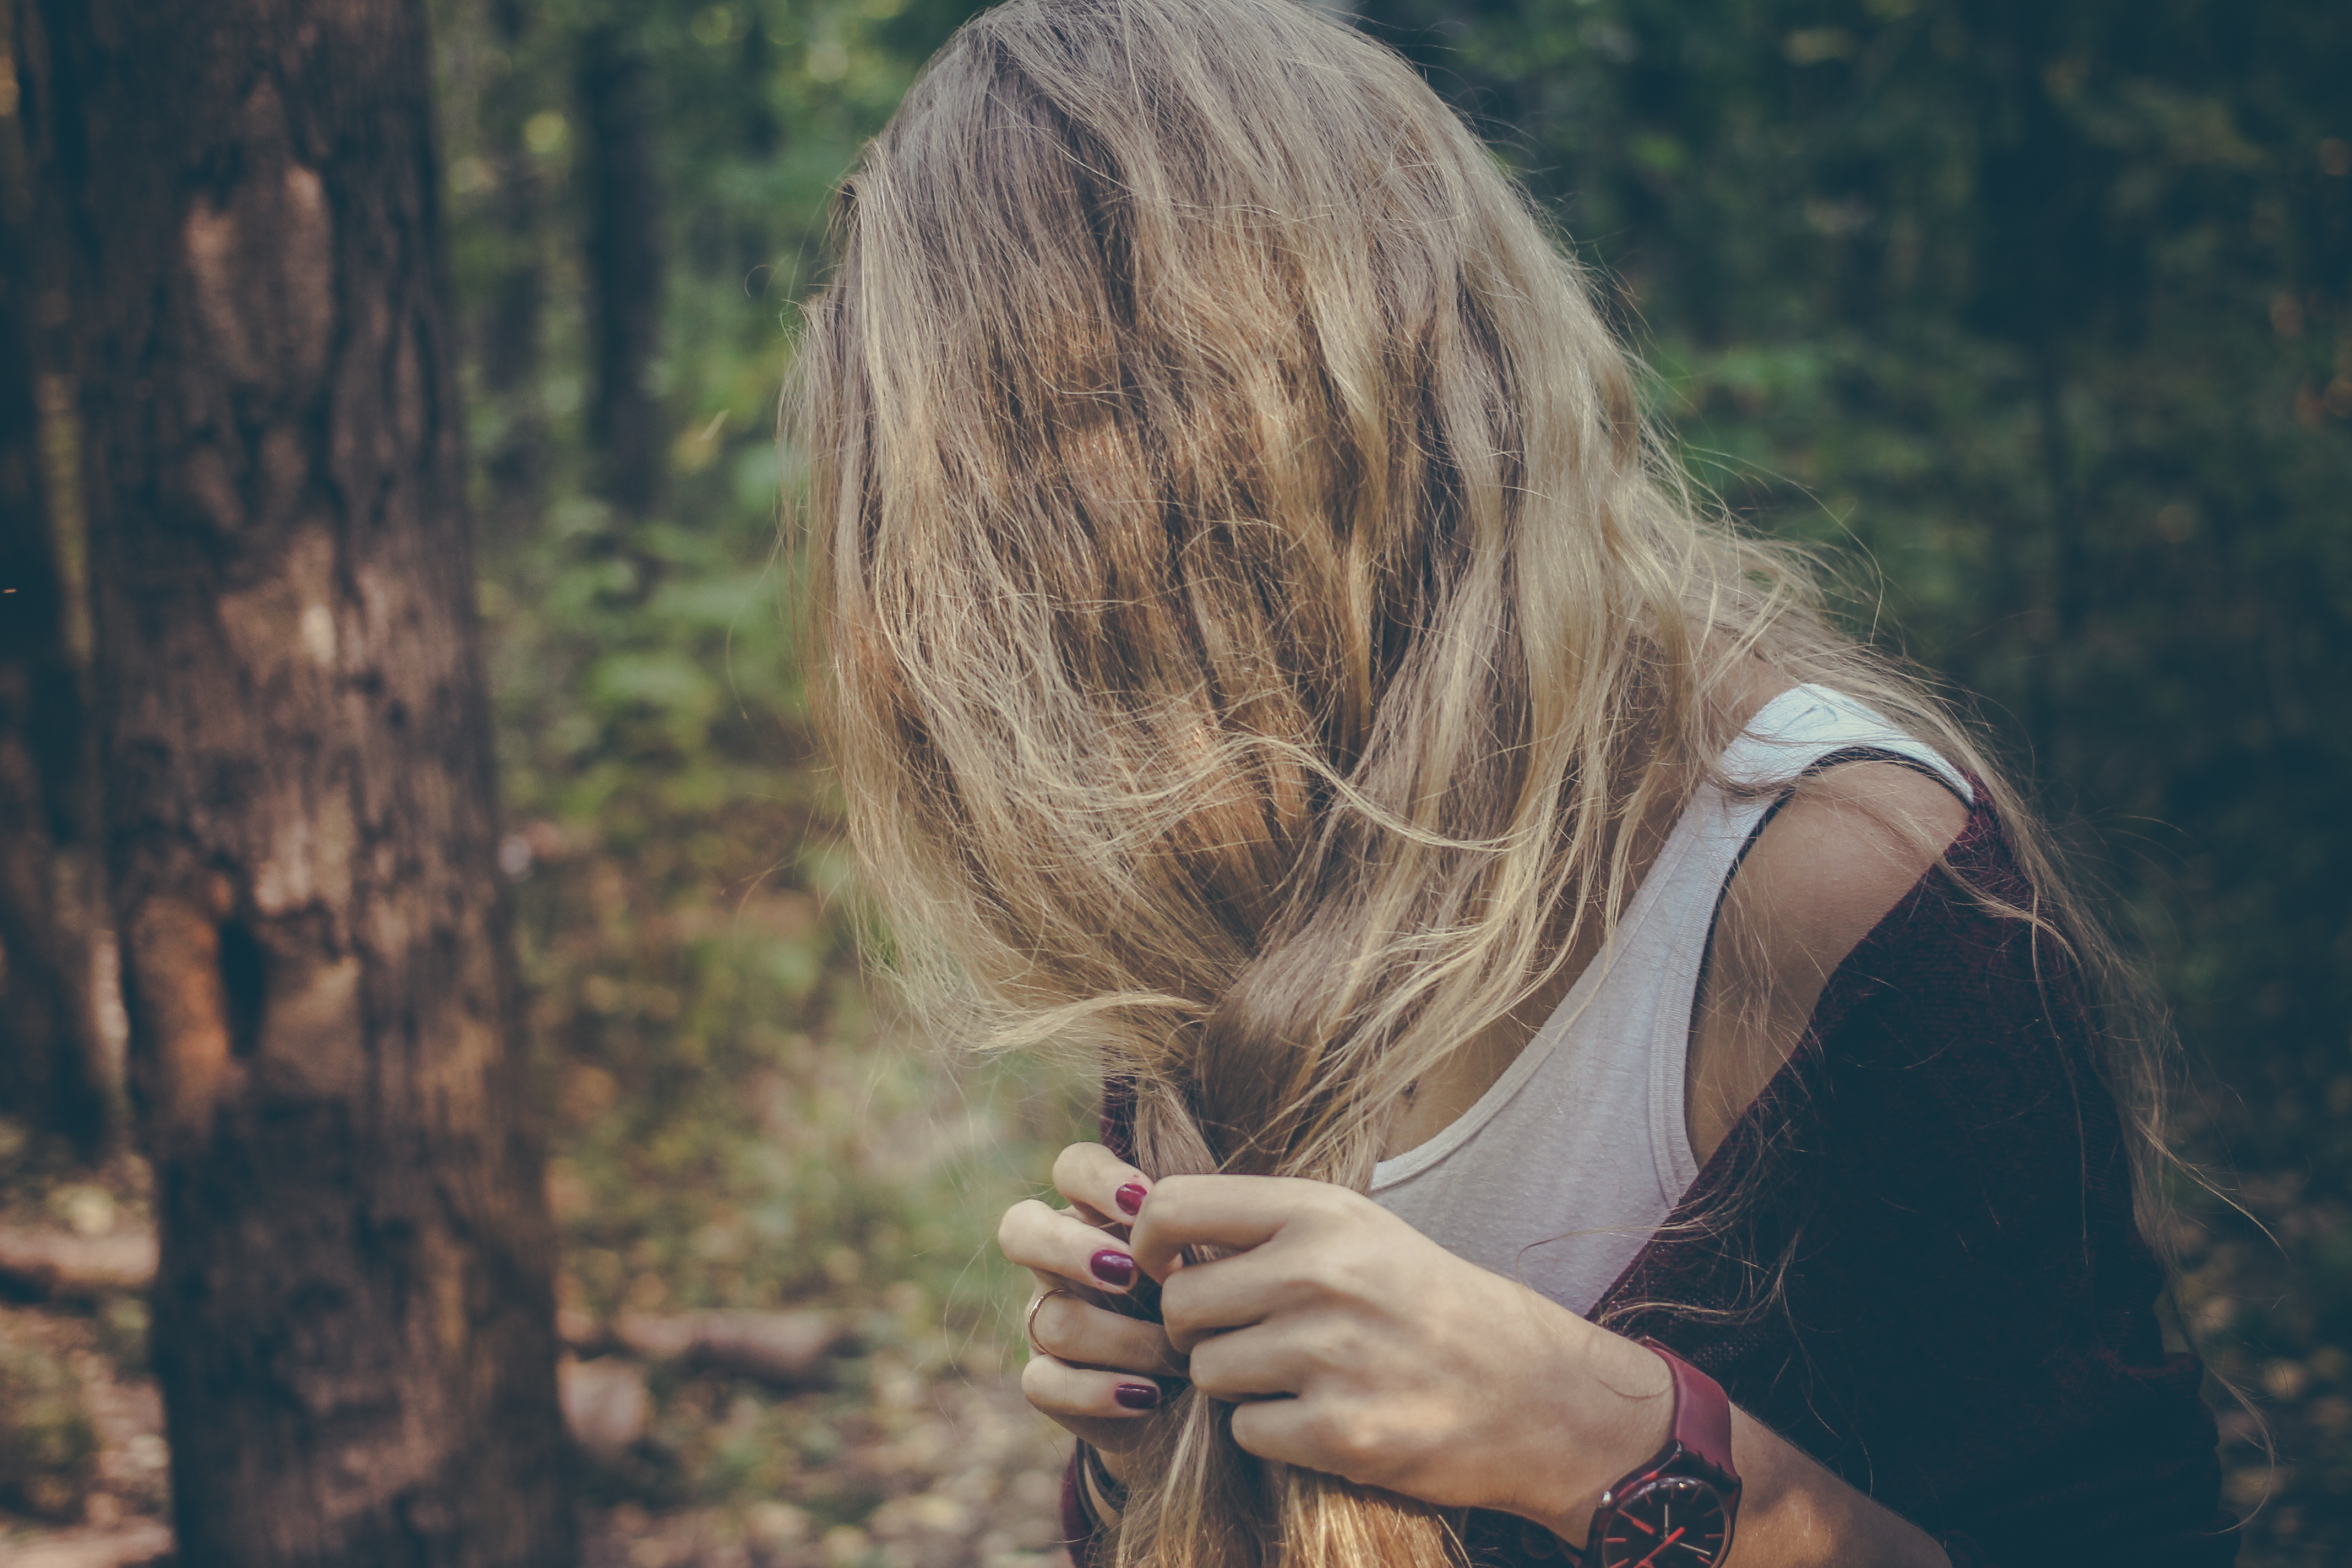 E編:「我的頭髮既厚重又毛躁,如果只是普通吹乾它居然會像馬尾巴那樣蓬、豐厚,我好想要絲質滑順般的頭髮呀!」